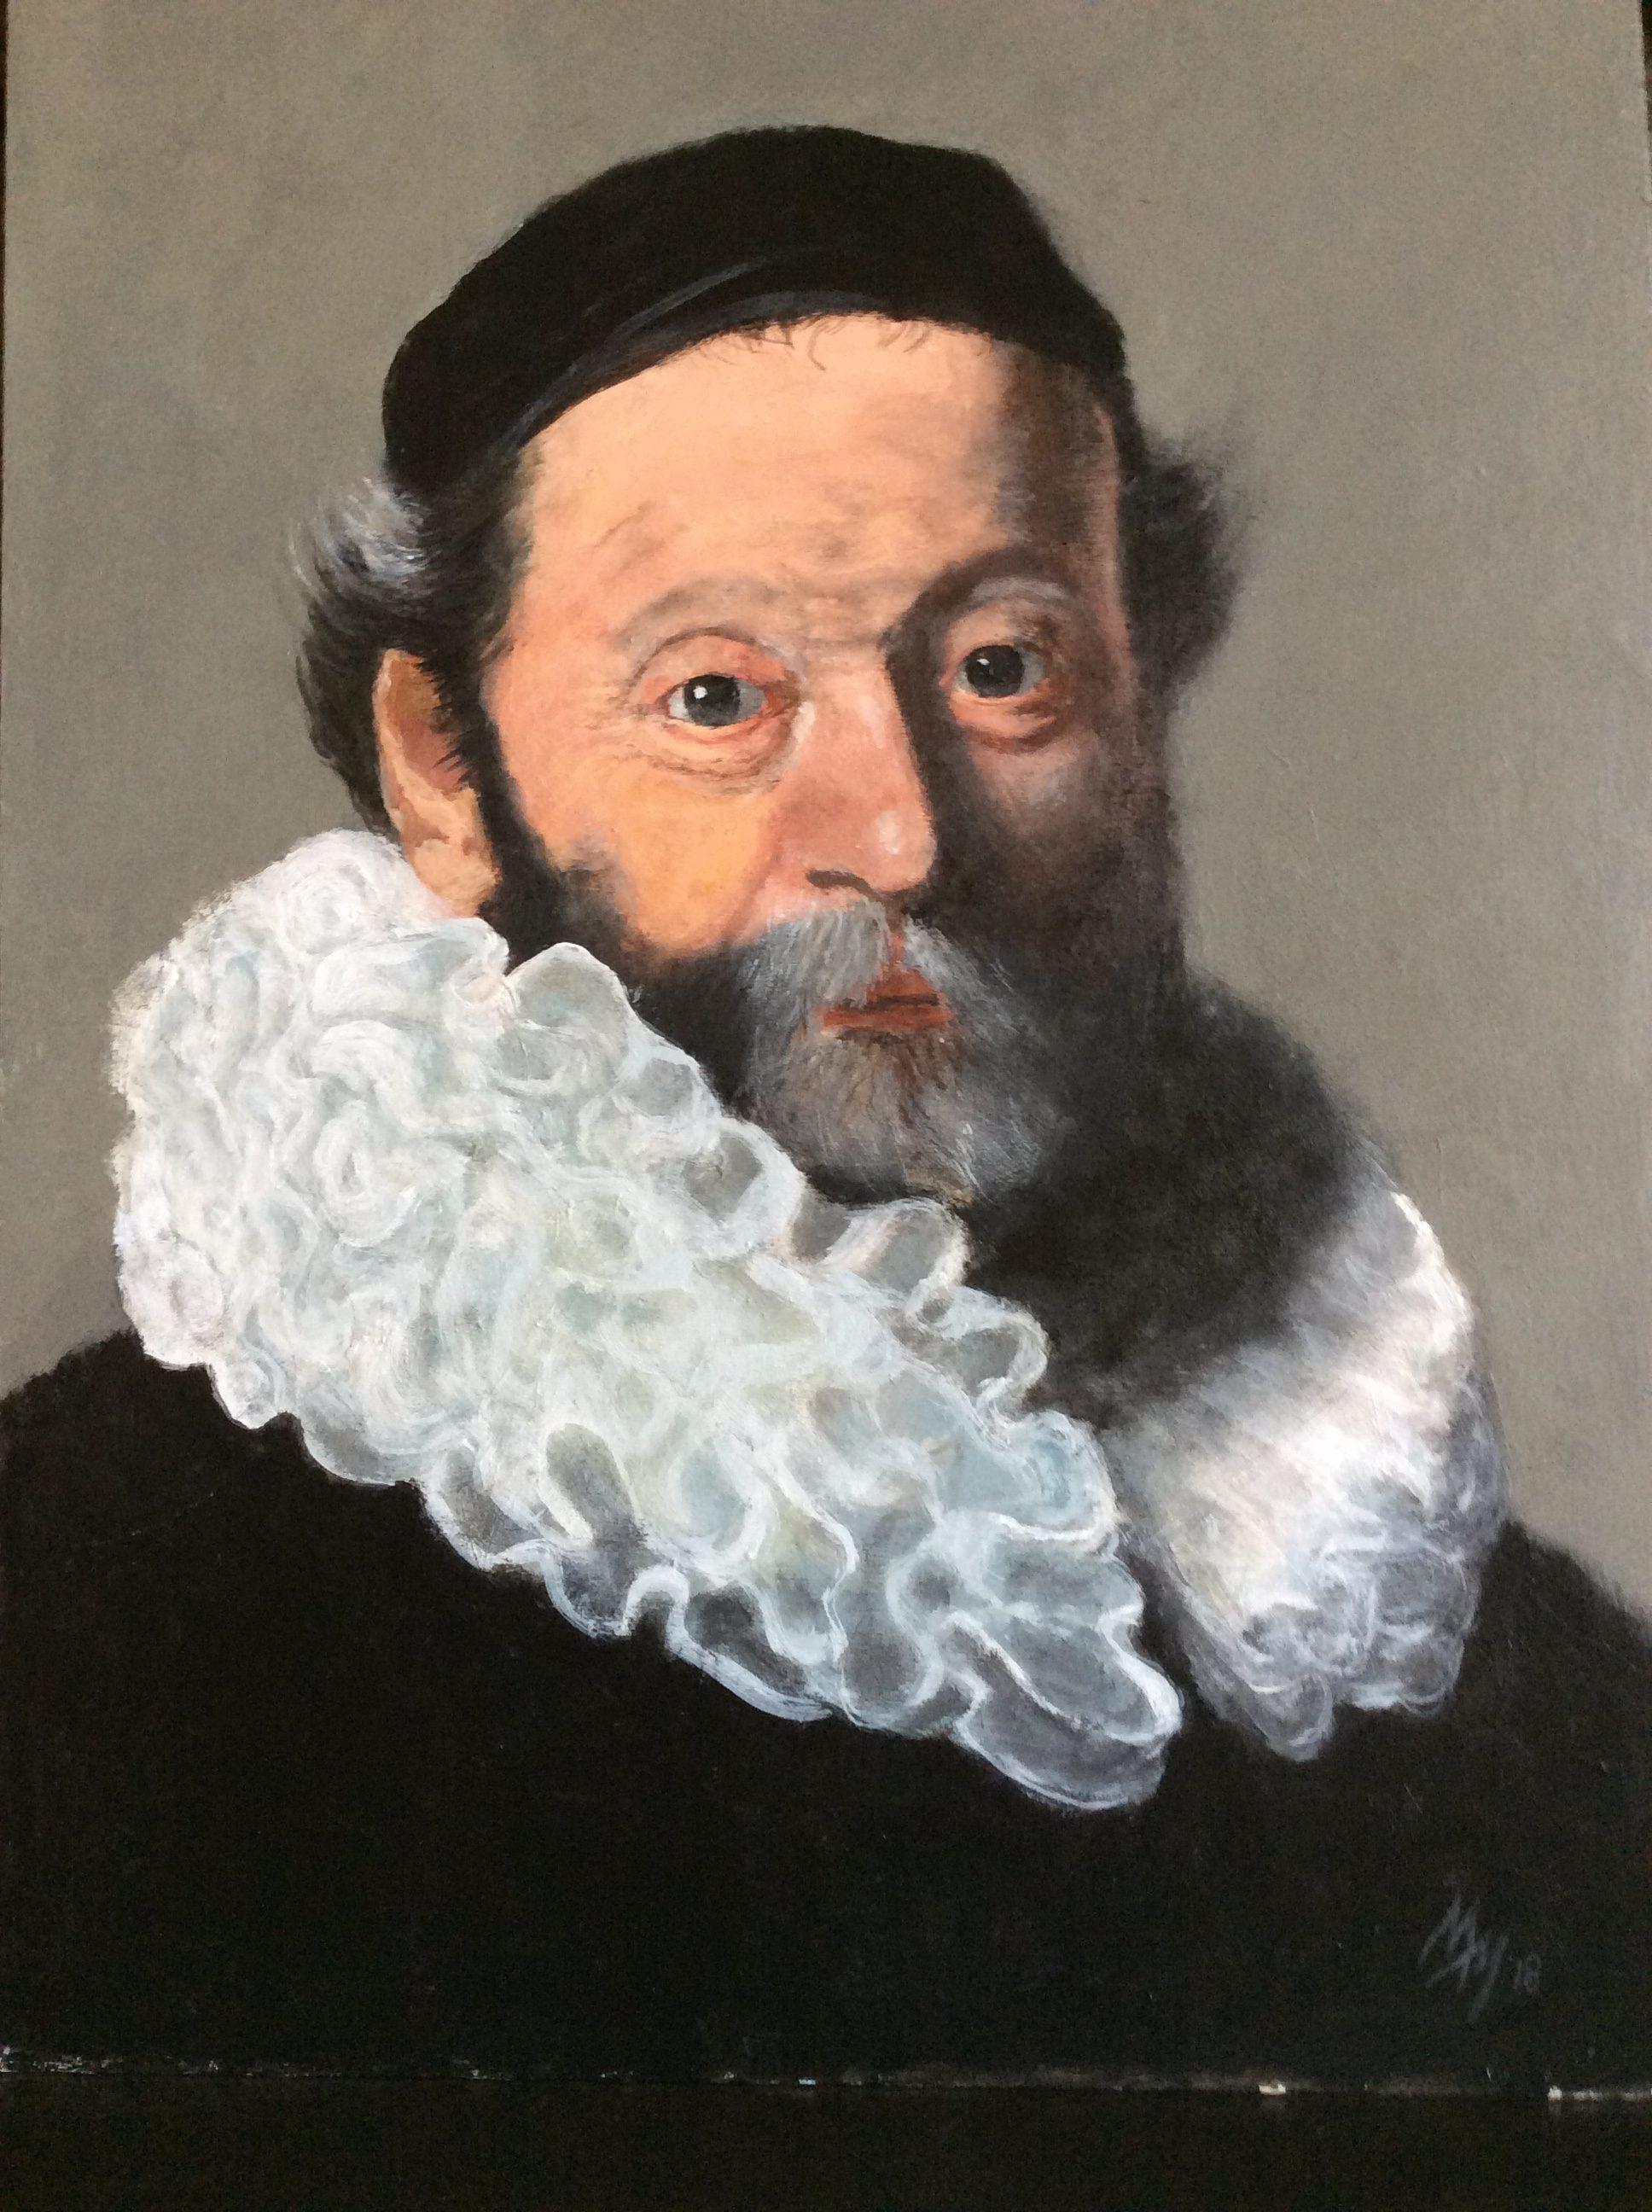 Dominee Wtenbogart 1644, in acryl, 48.5 x 35.5 cm